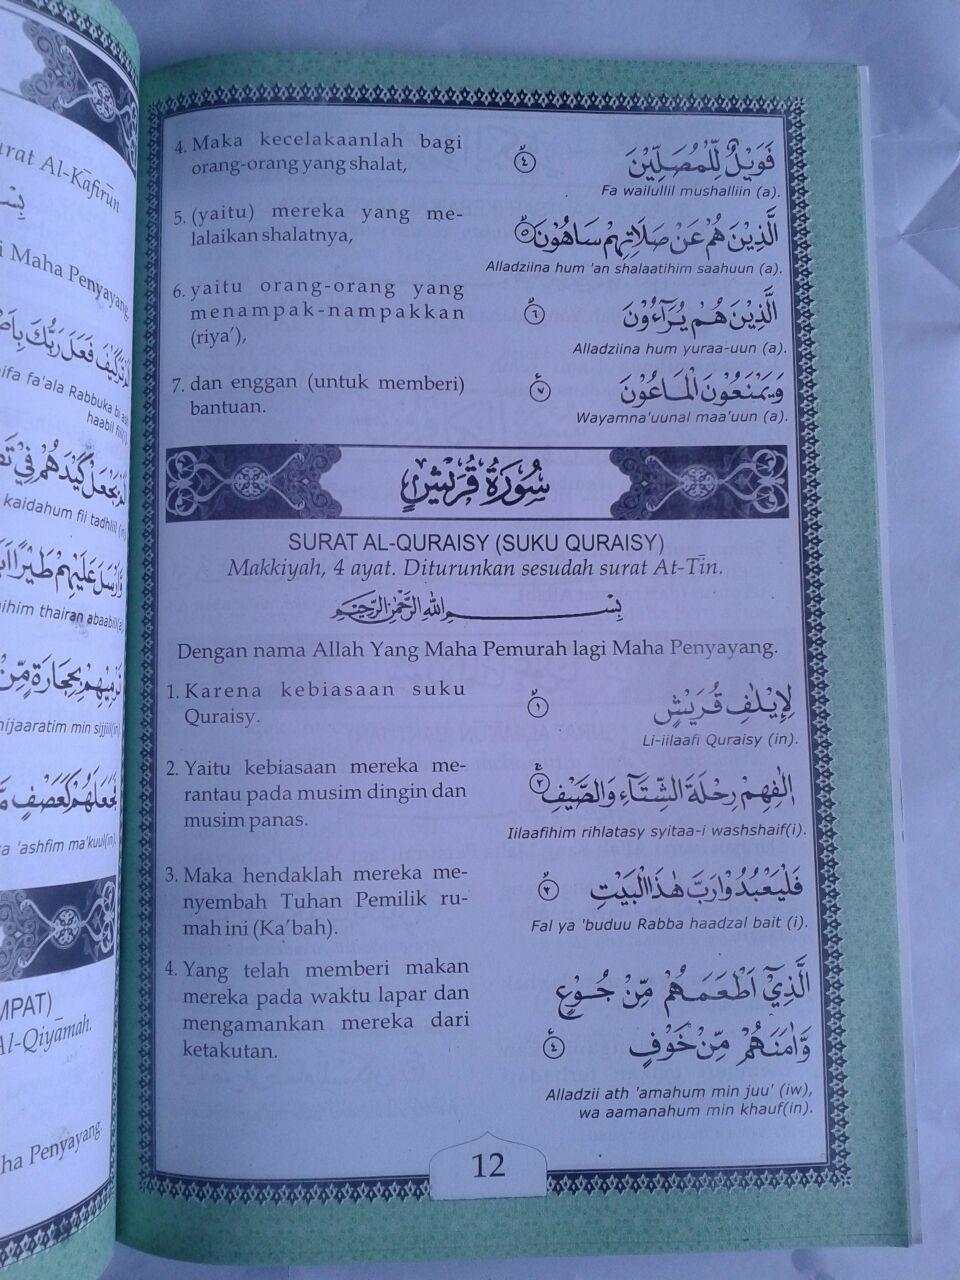 Buku Terjemah Juz Amma Disertai Lafal Transliterasi Ukuran A4 isi 2